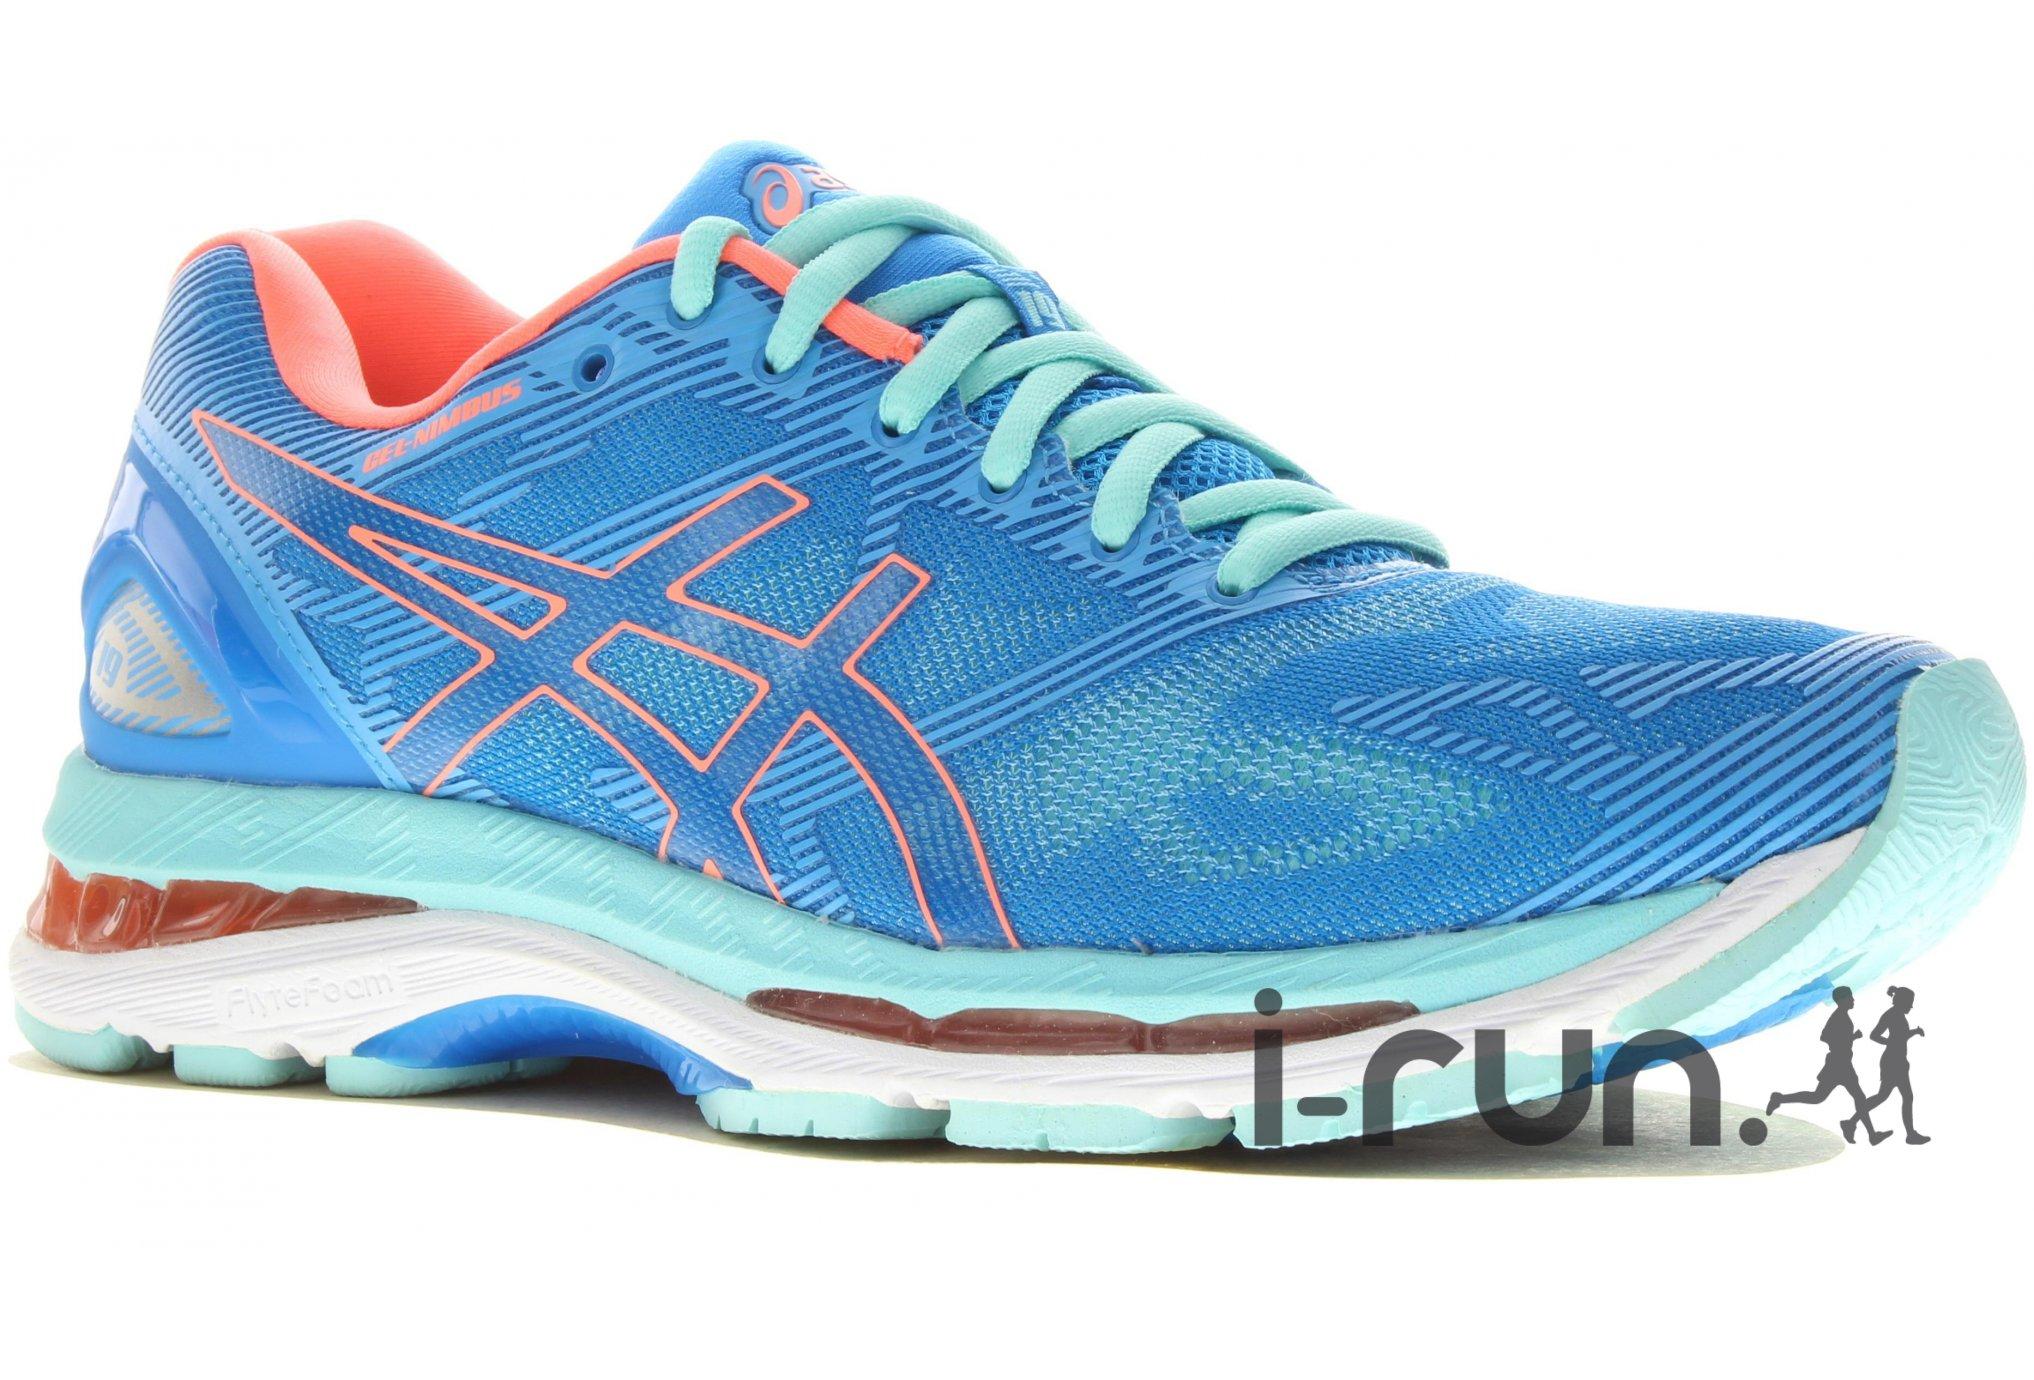 Asics Gel-Nimbus 19 W Chaussures running femme